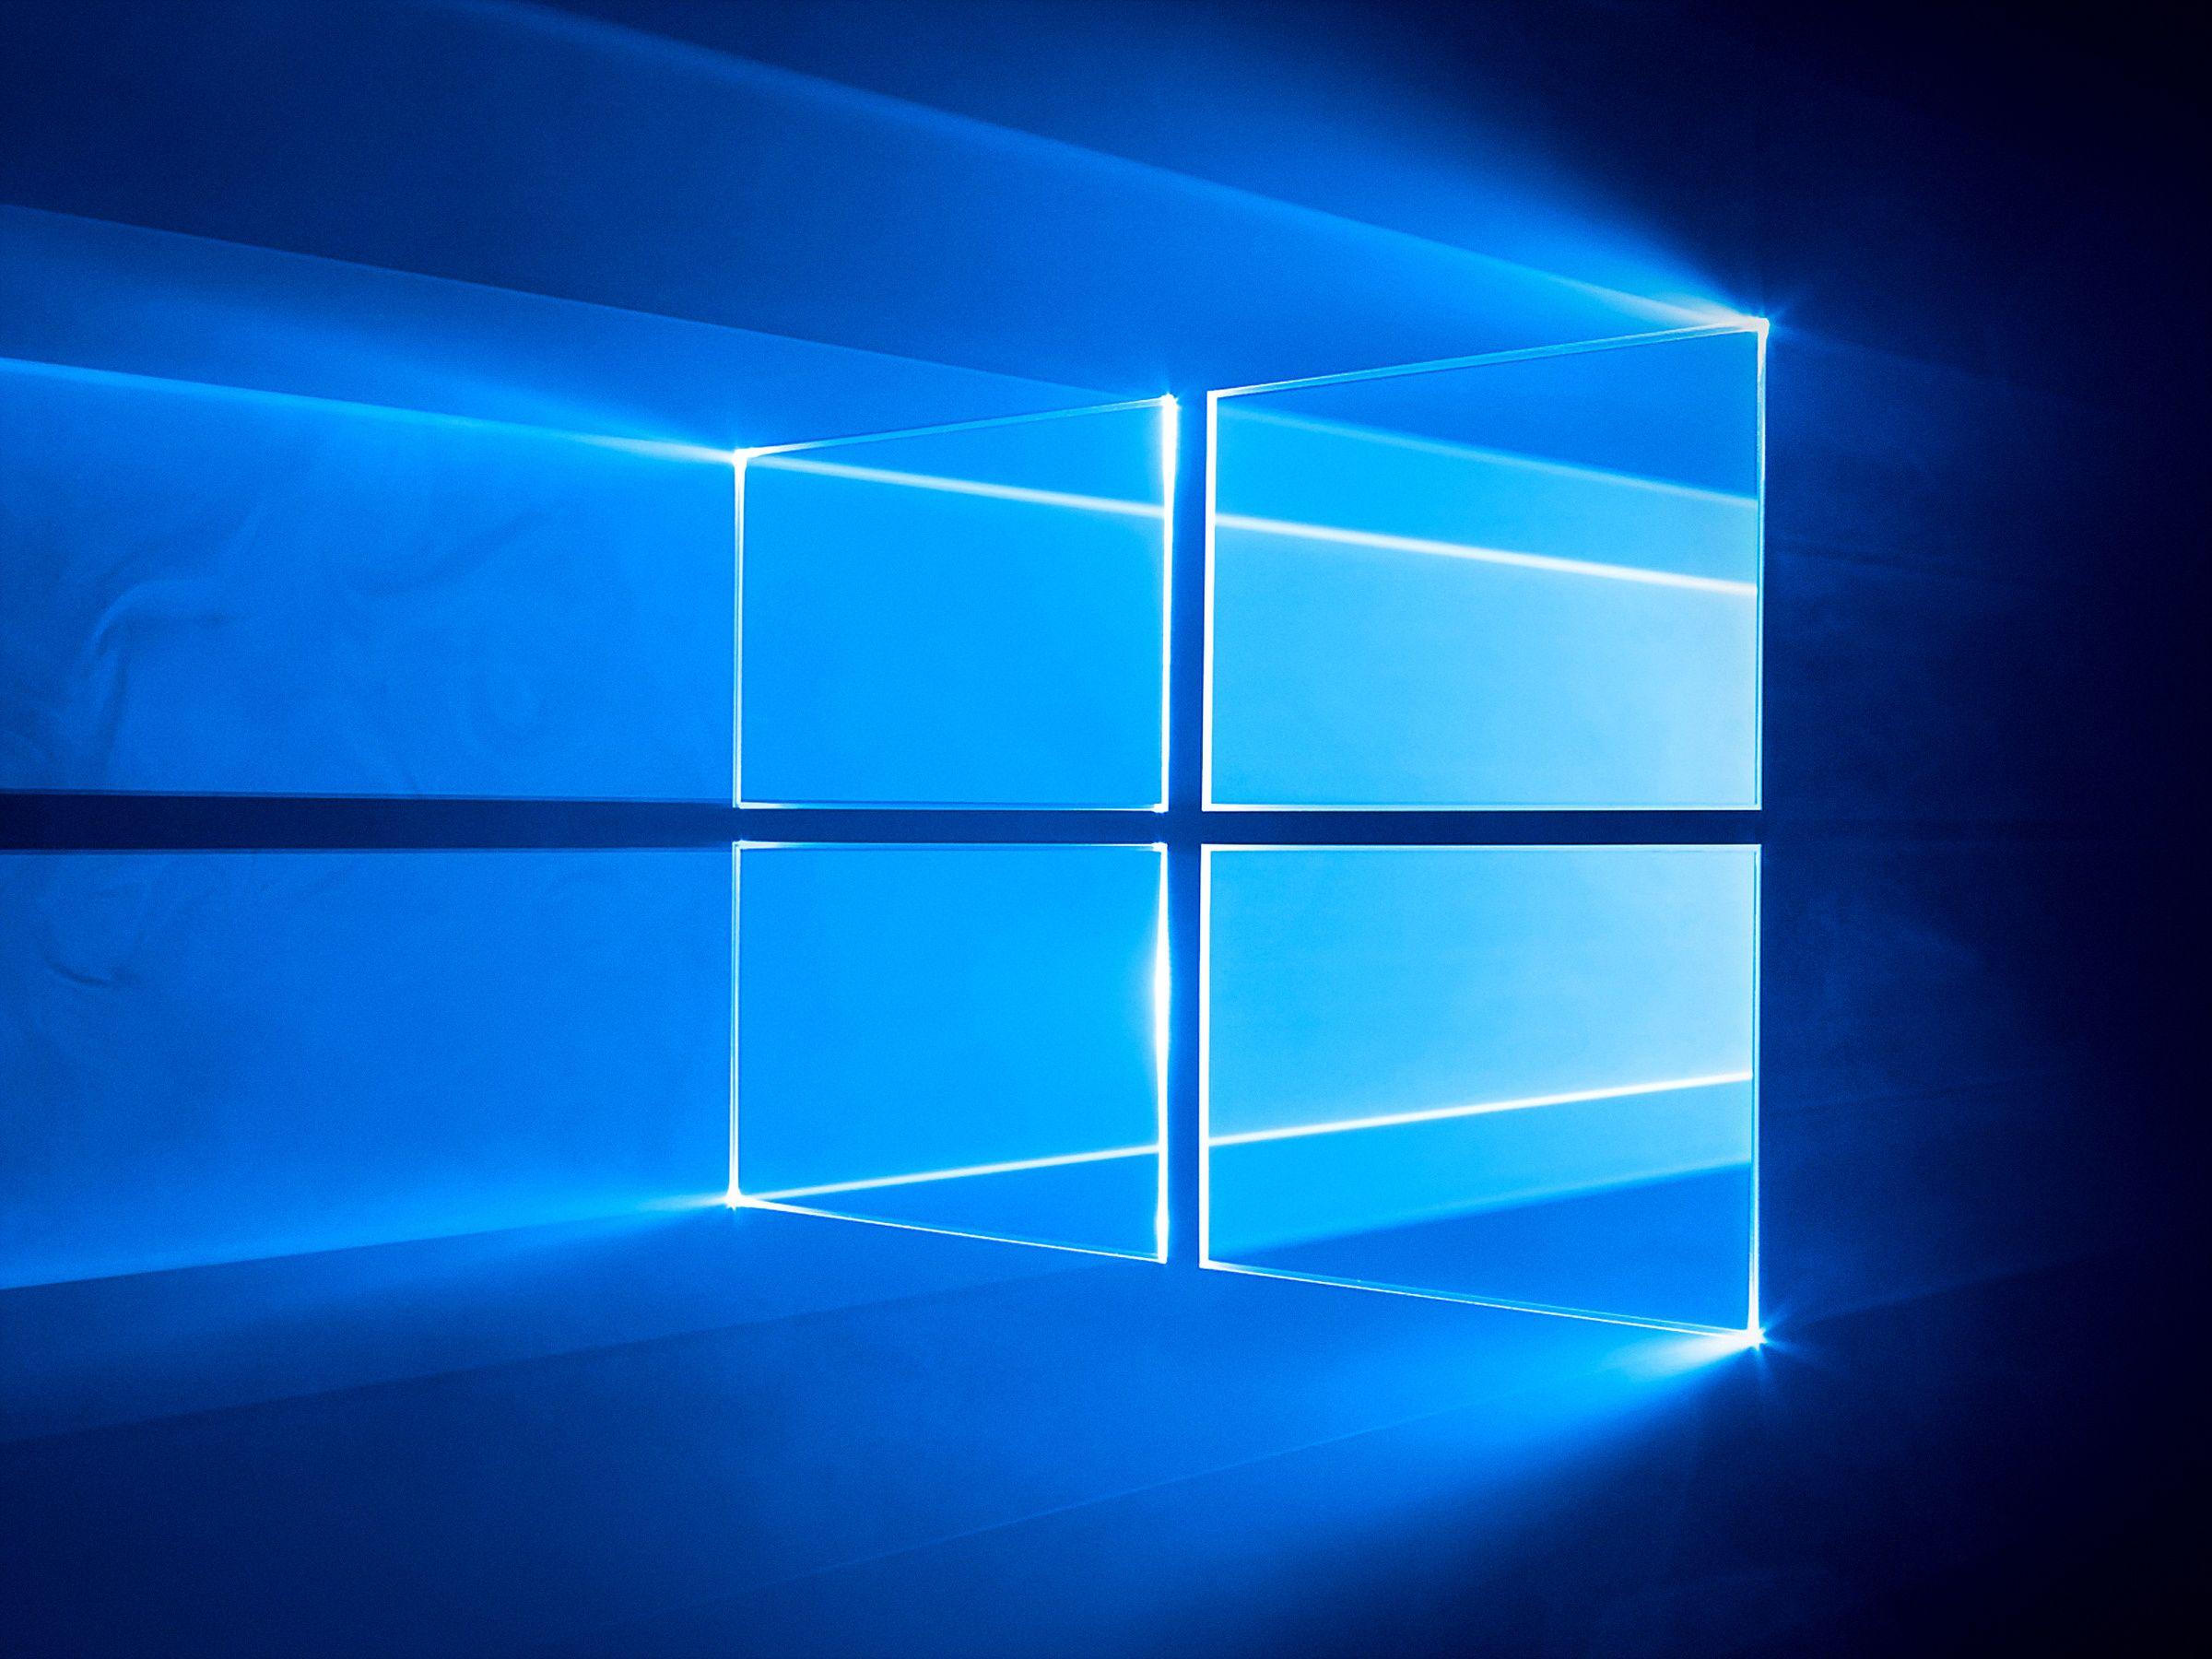 Windows 10 Windows 10 Microsoft Support Windows